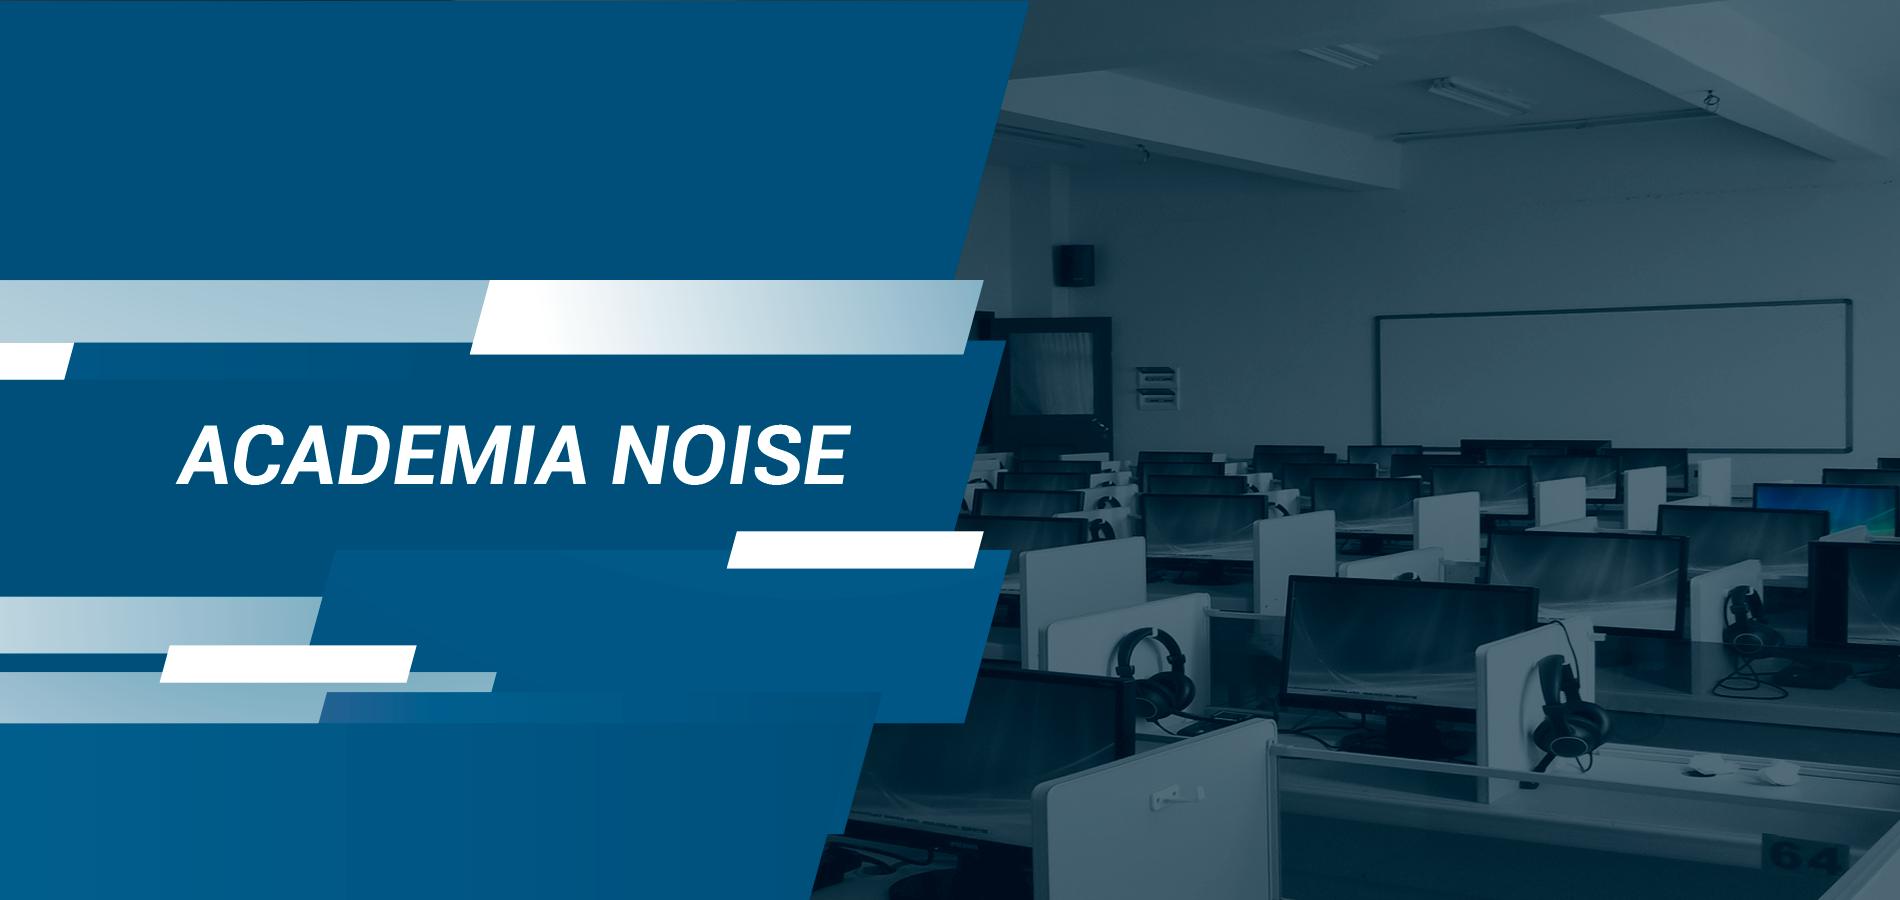 academia noise